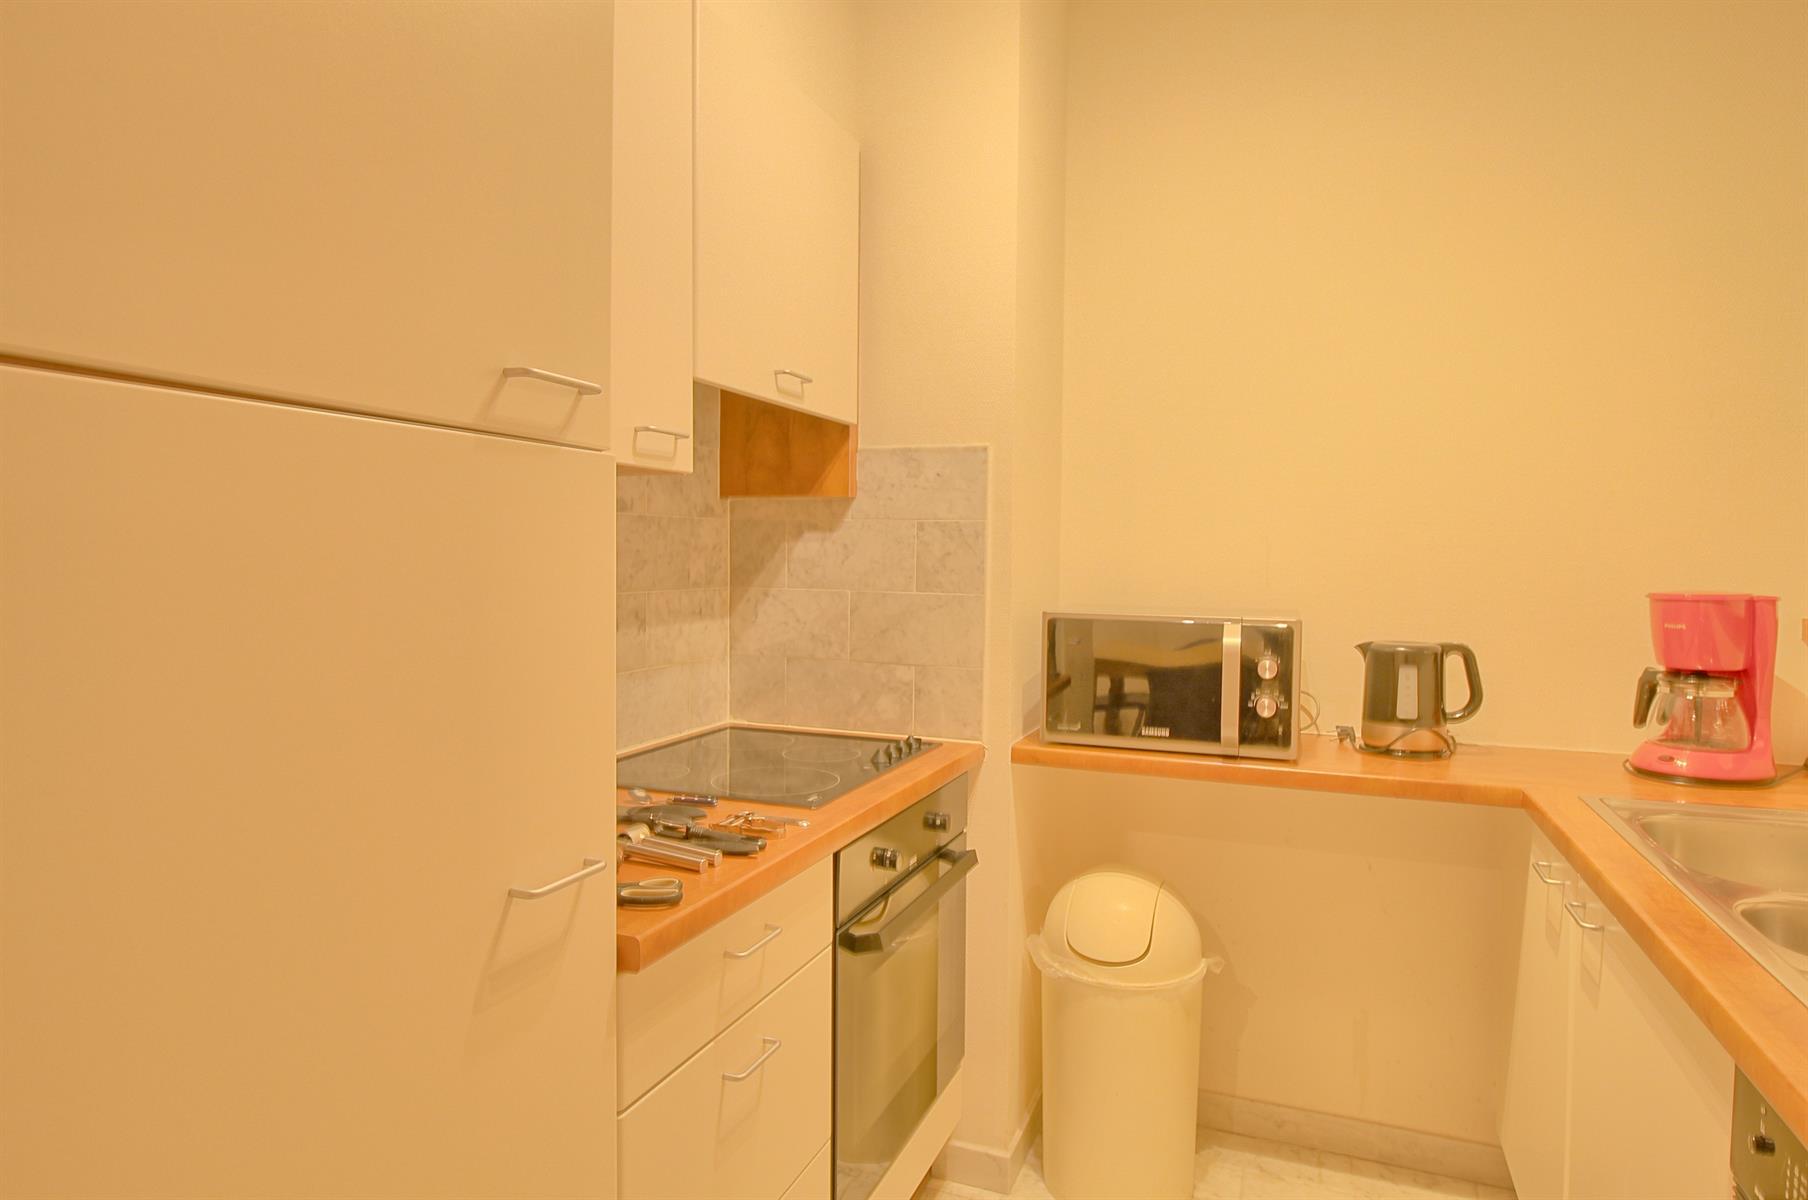 Appartement - Woluwe-Saint-Lambert - #4208881-1